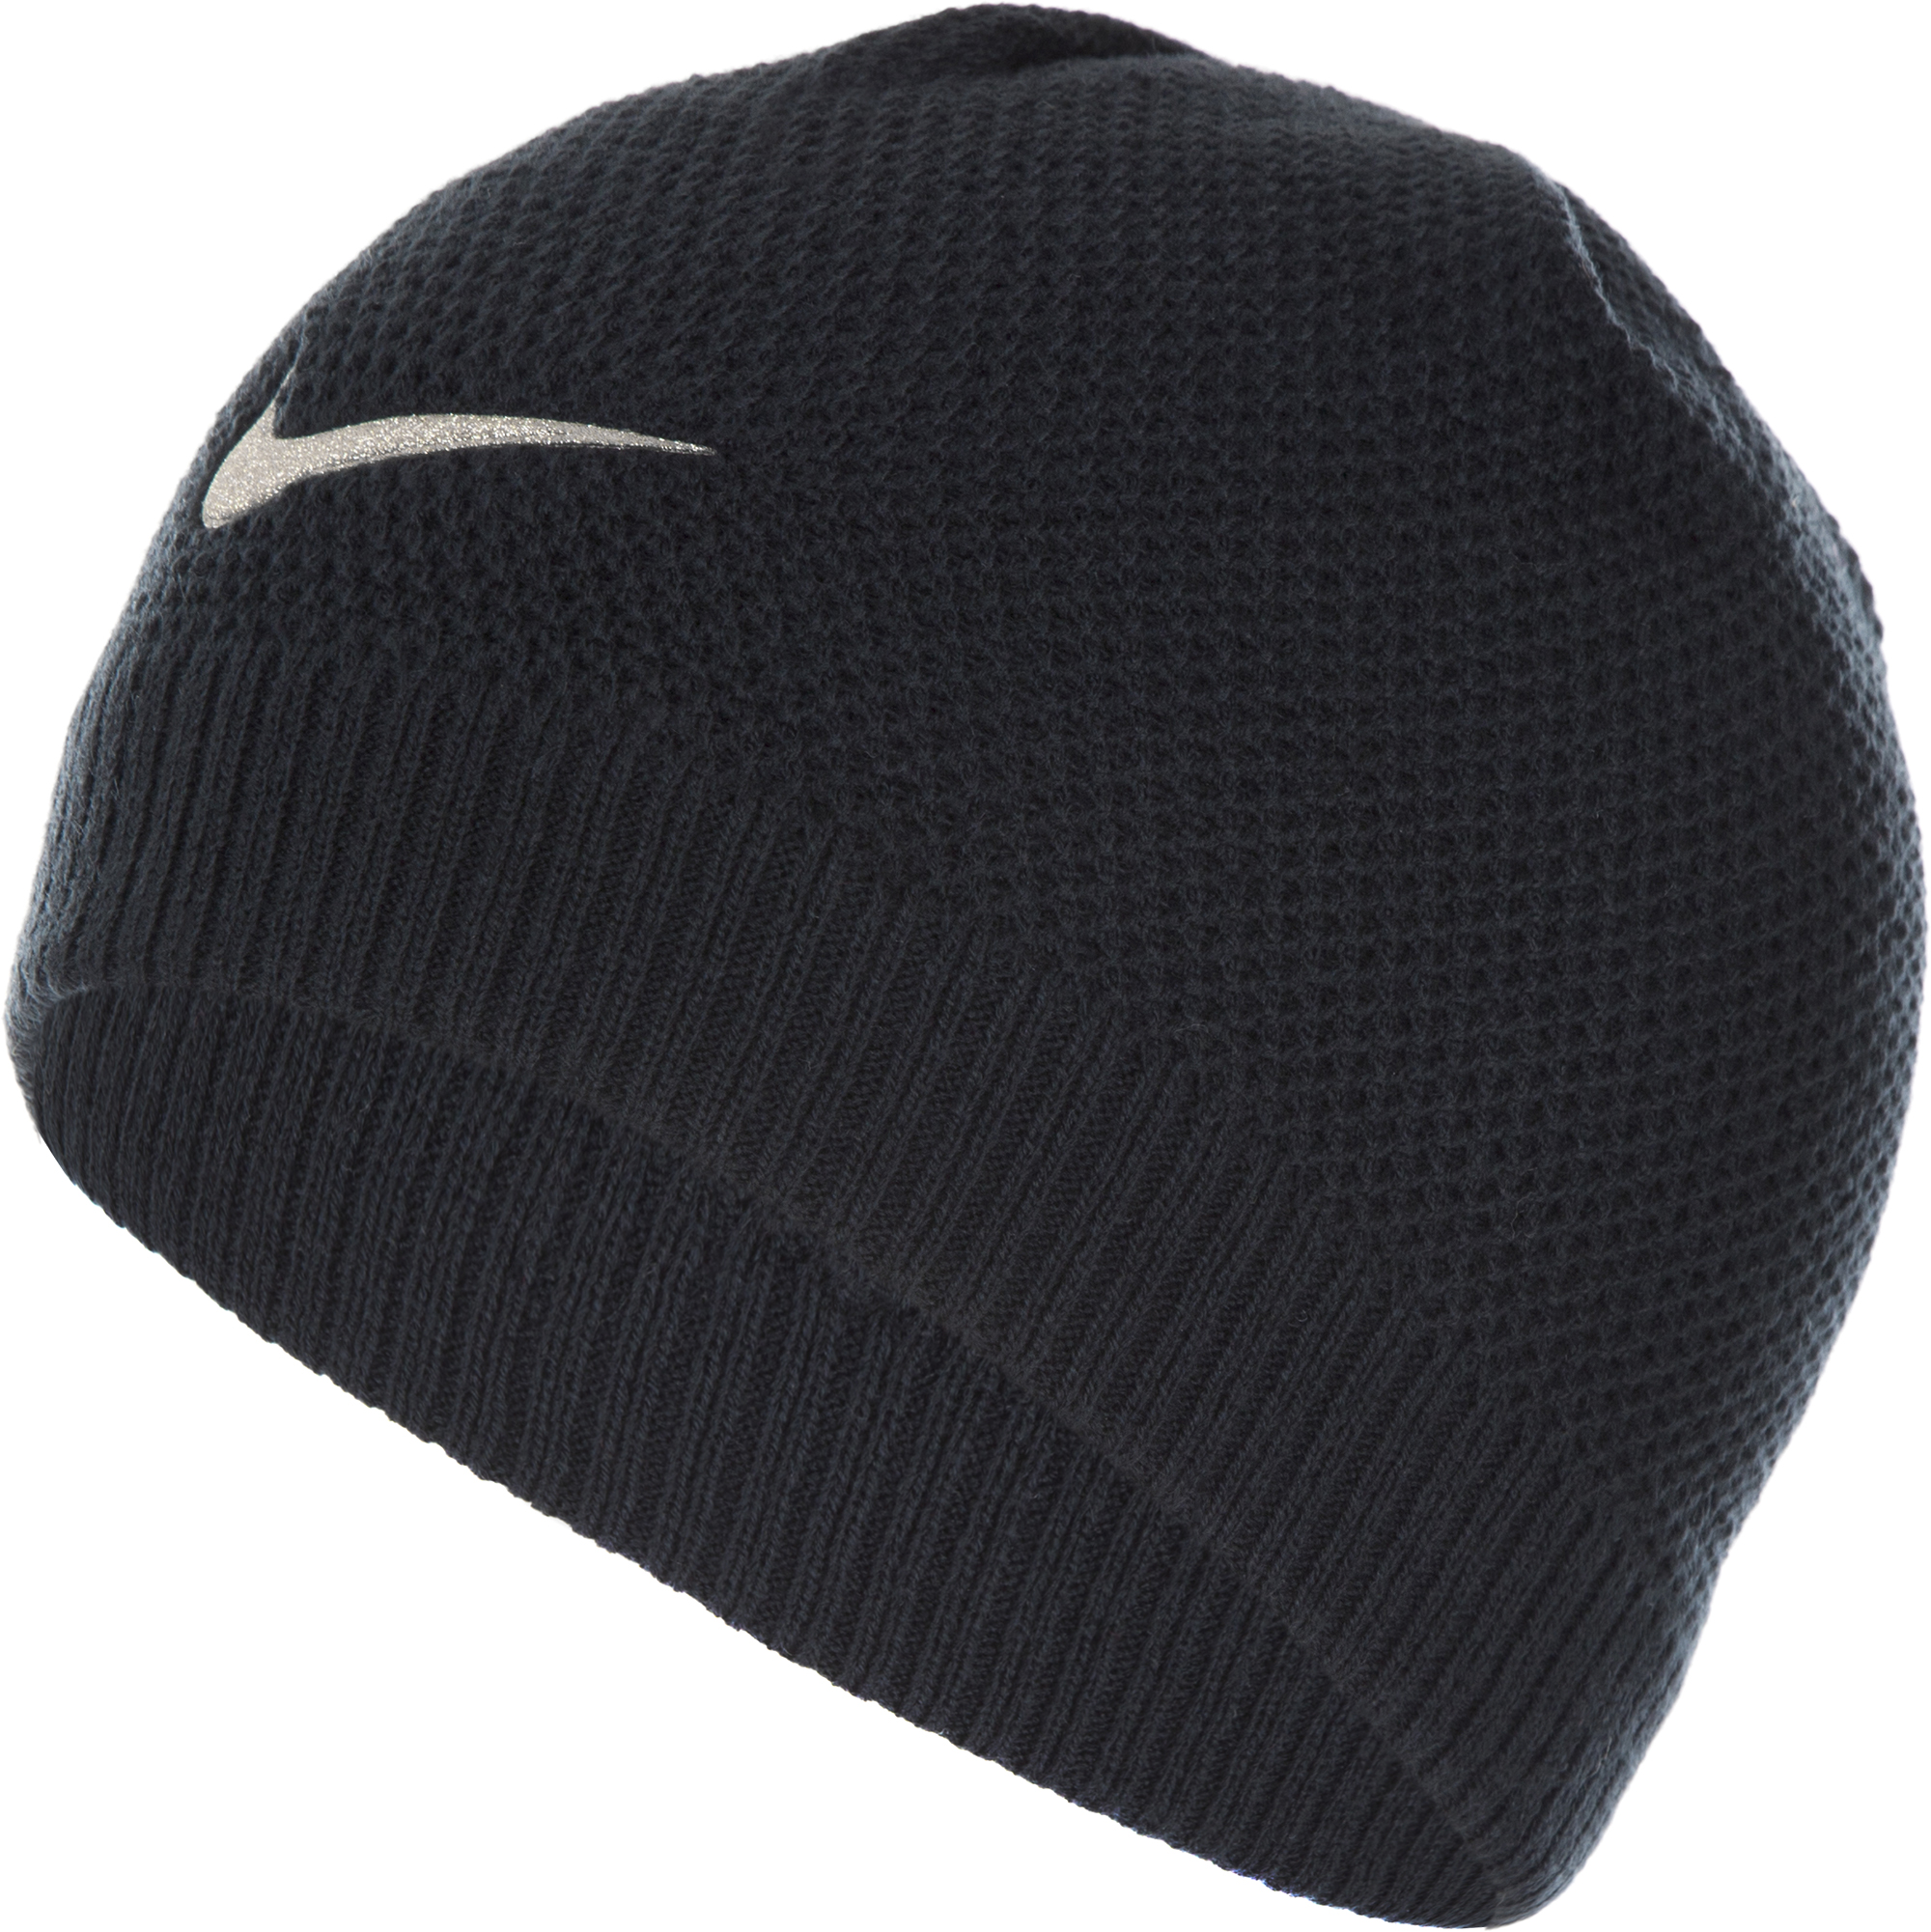 Nike Шапка для девочек Nike Pony Tail шапочки и чепчики acoola шапка детская для девочек mol